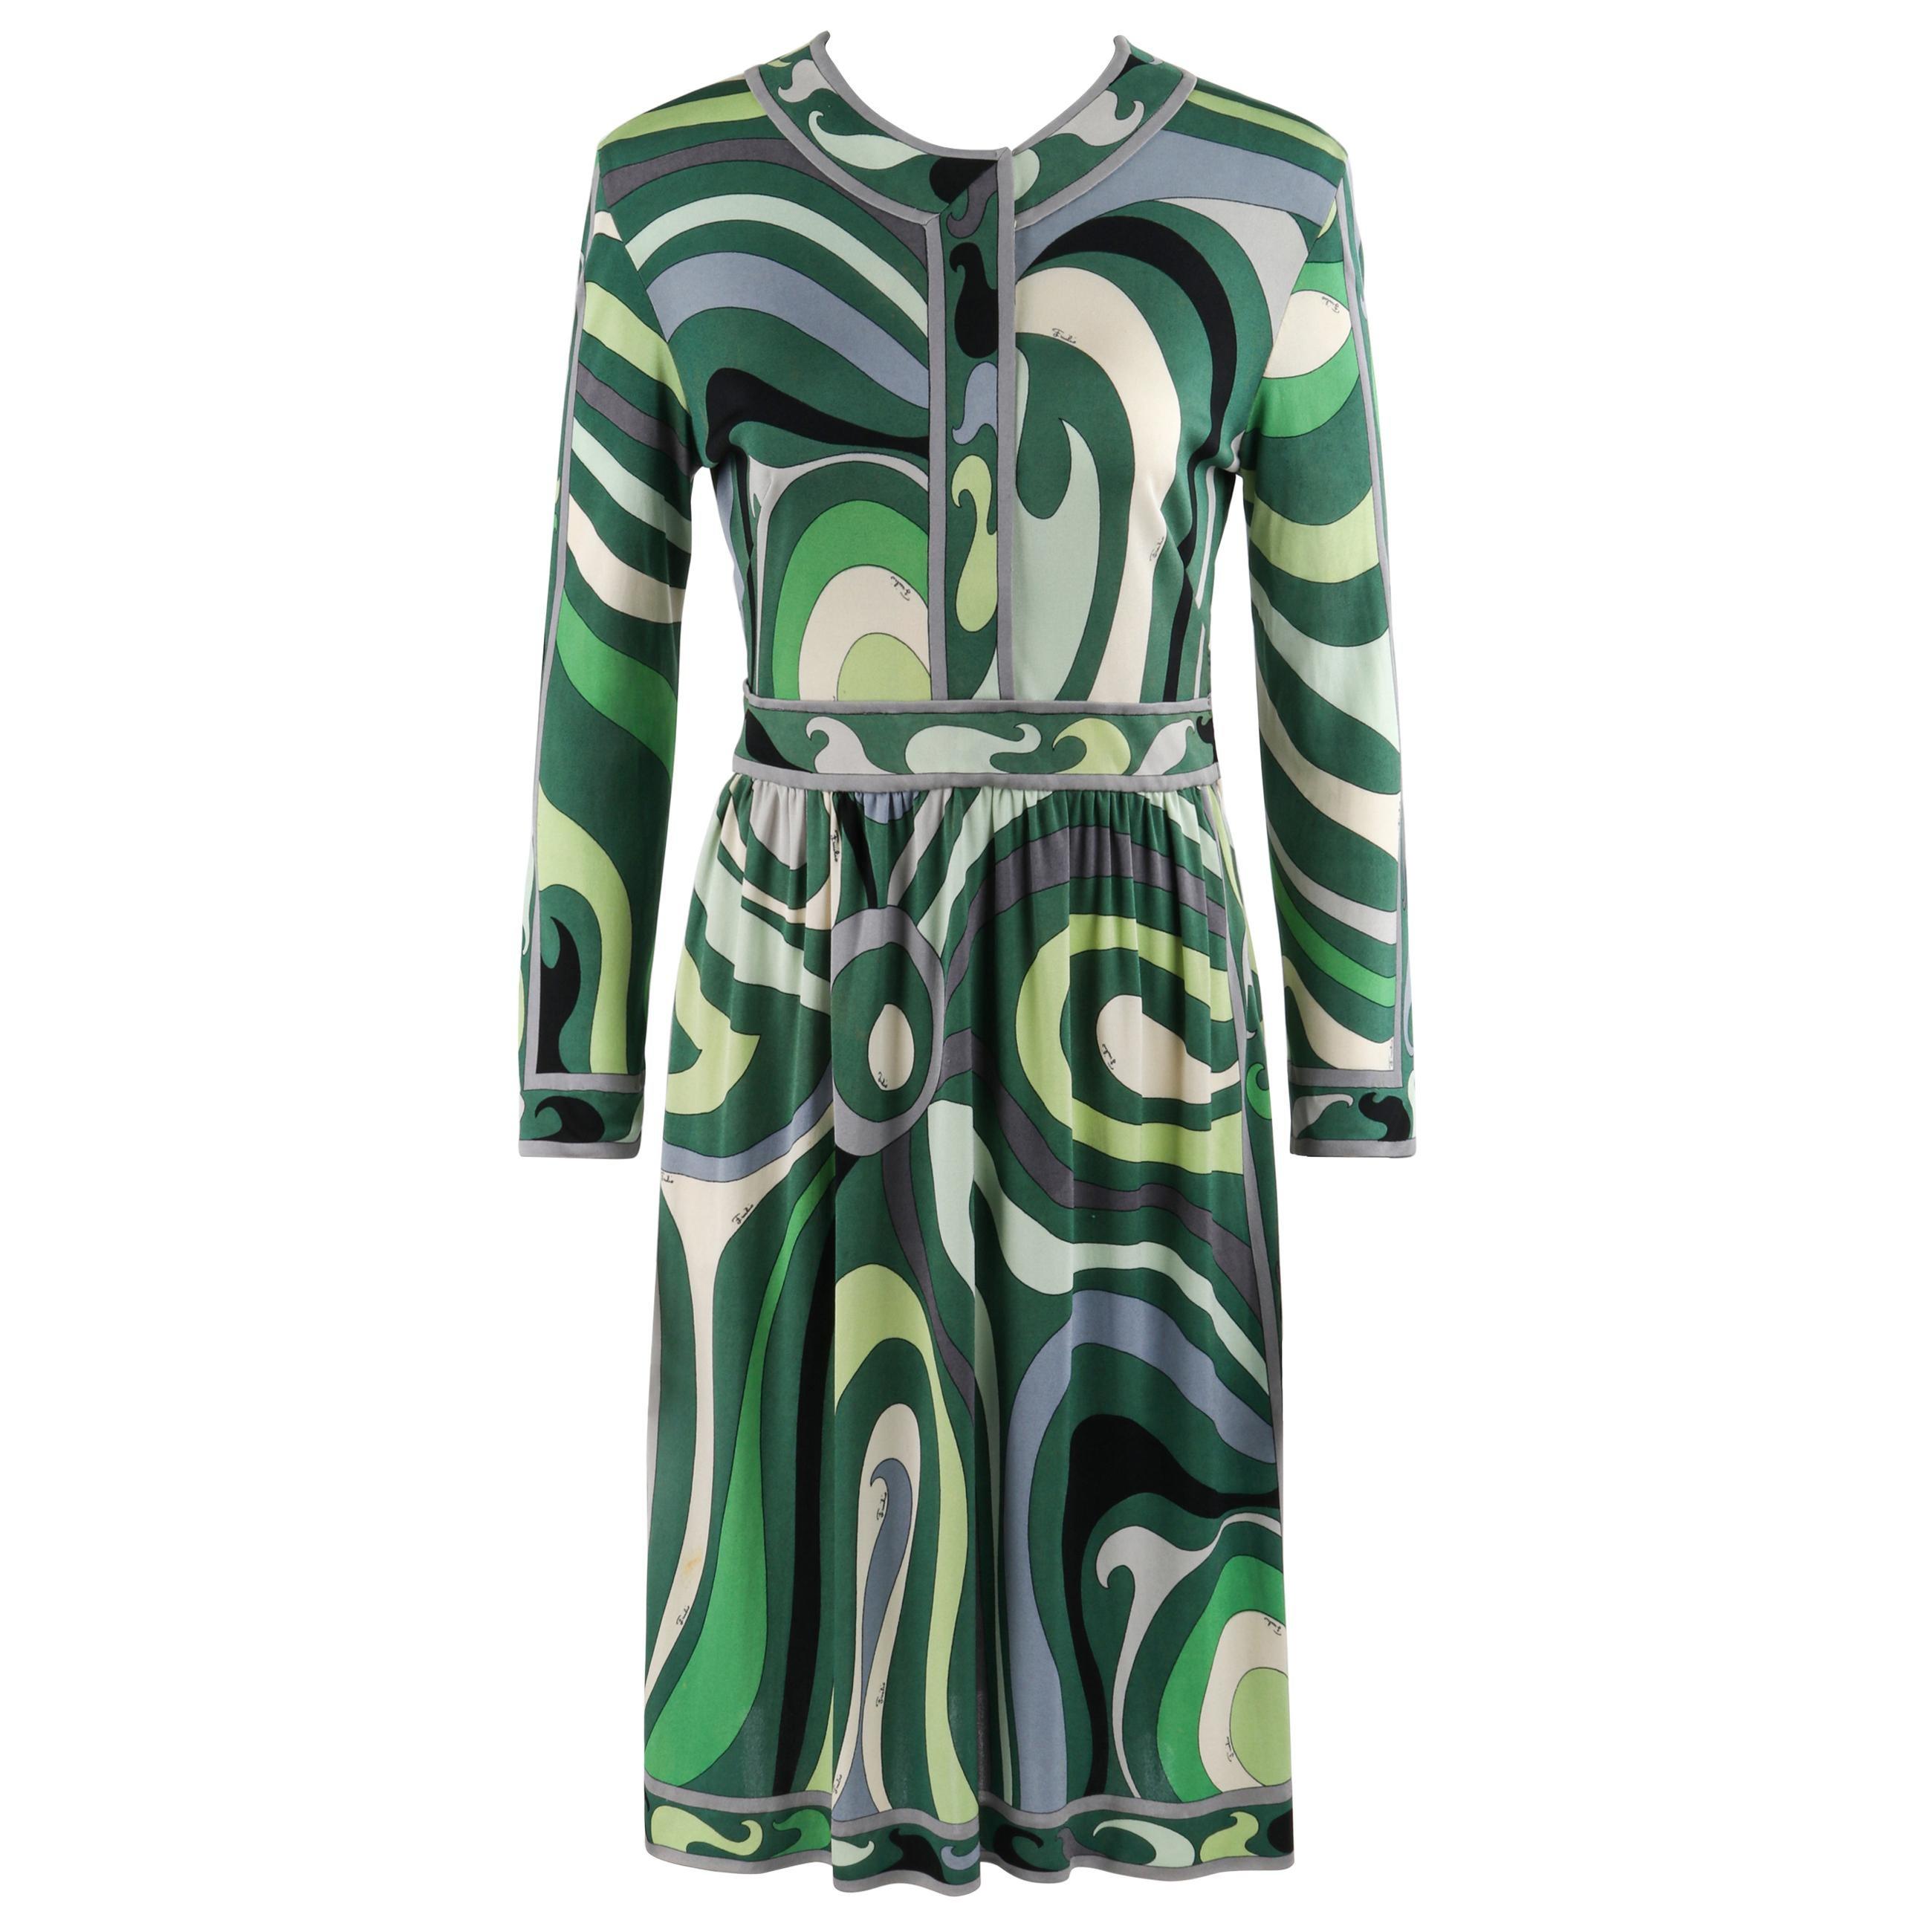 EMILIO PUCCI c.1960's Green Signature Op Art Long Sleeve Silk Jersey Shift Dress